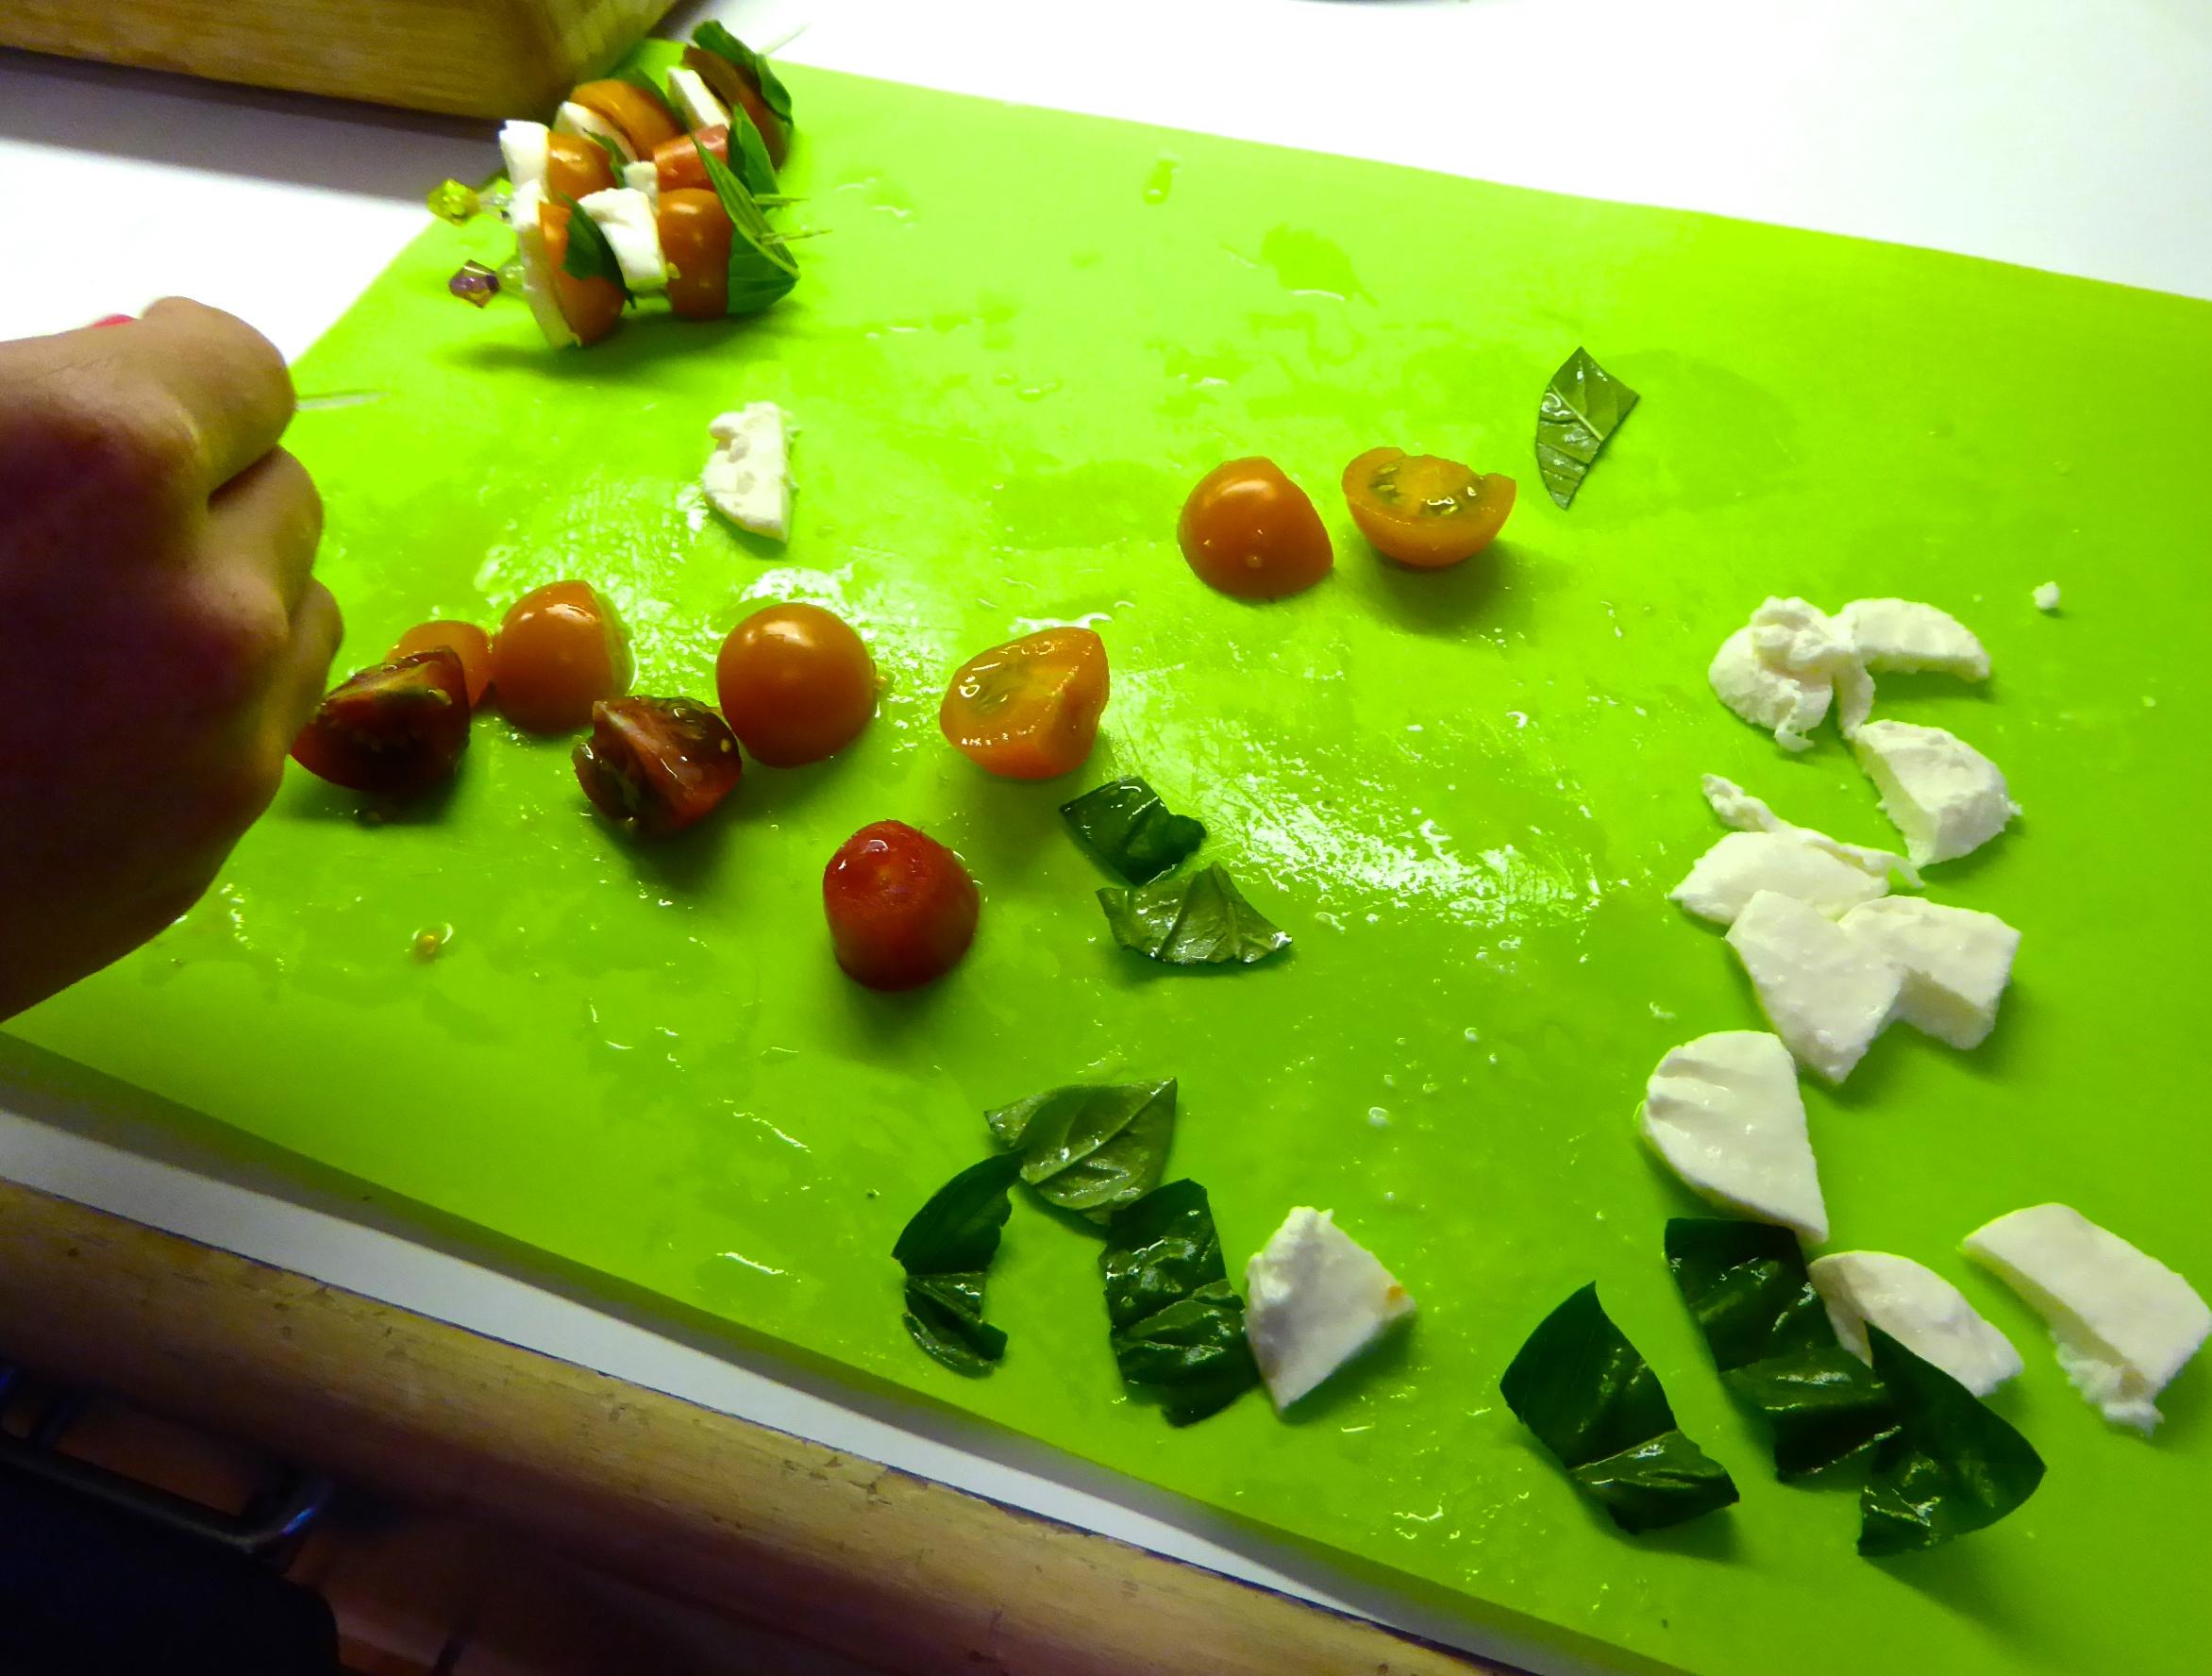 Prep for mini-caprese salad on a skewer